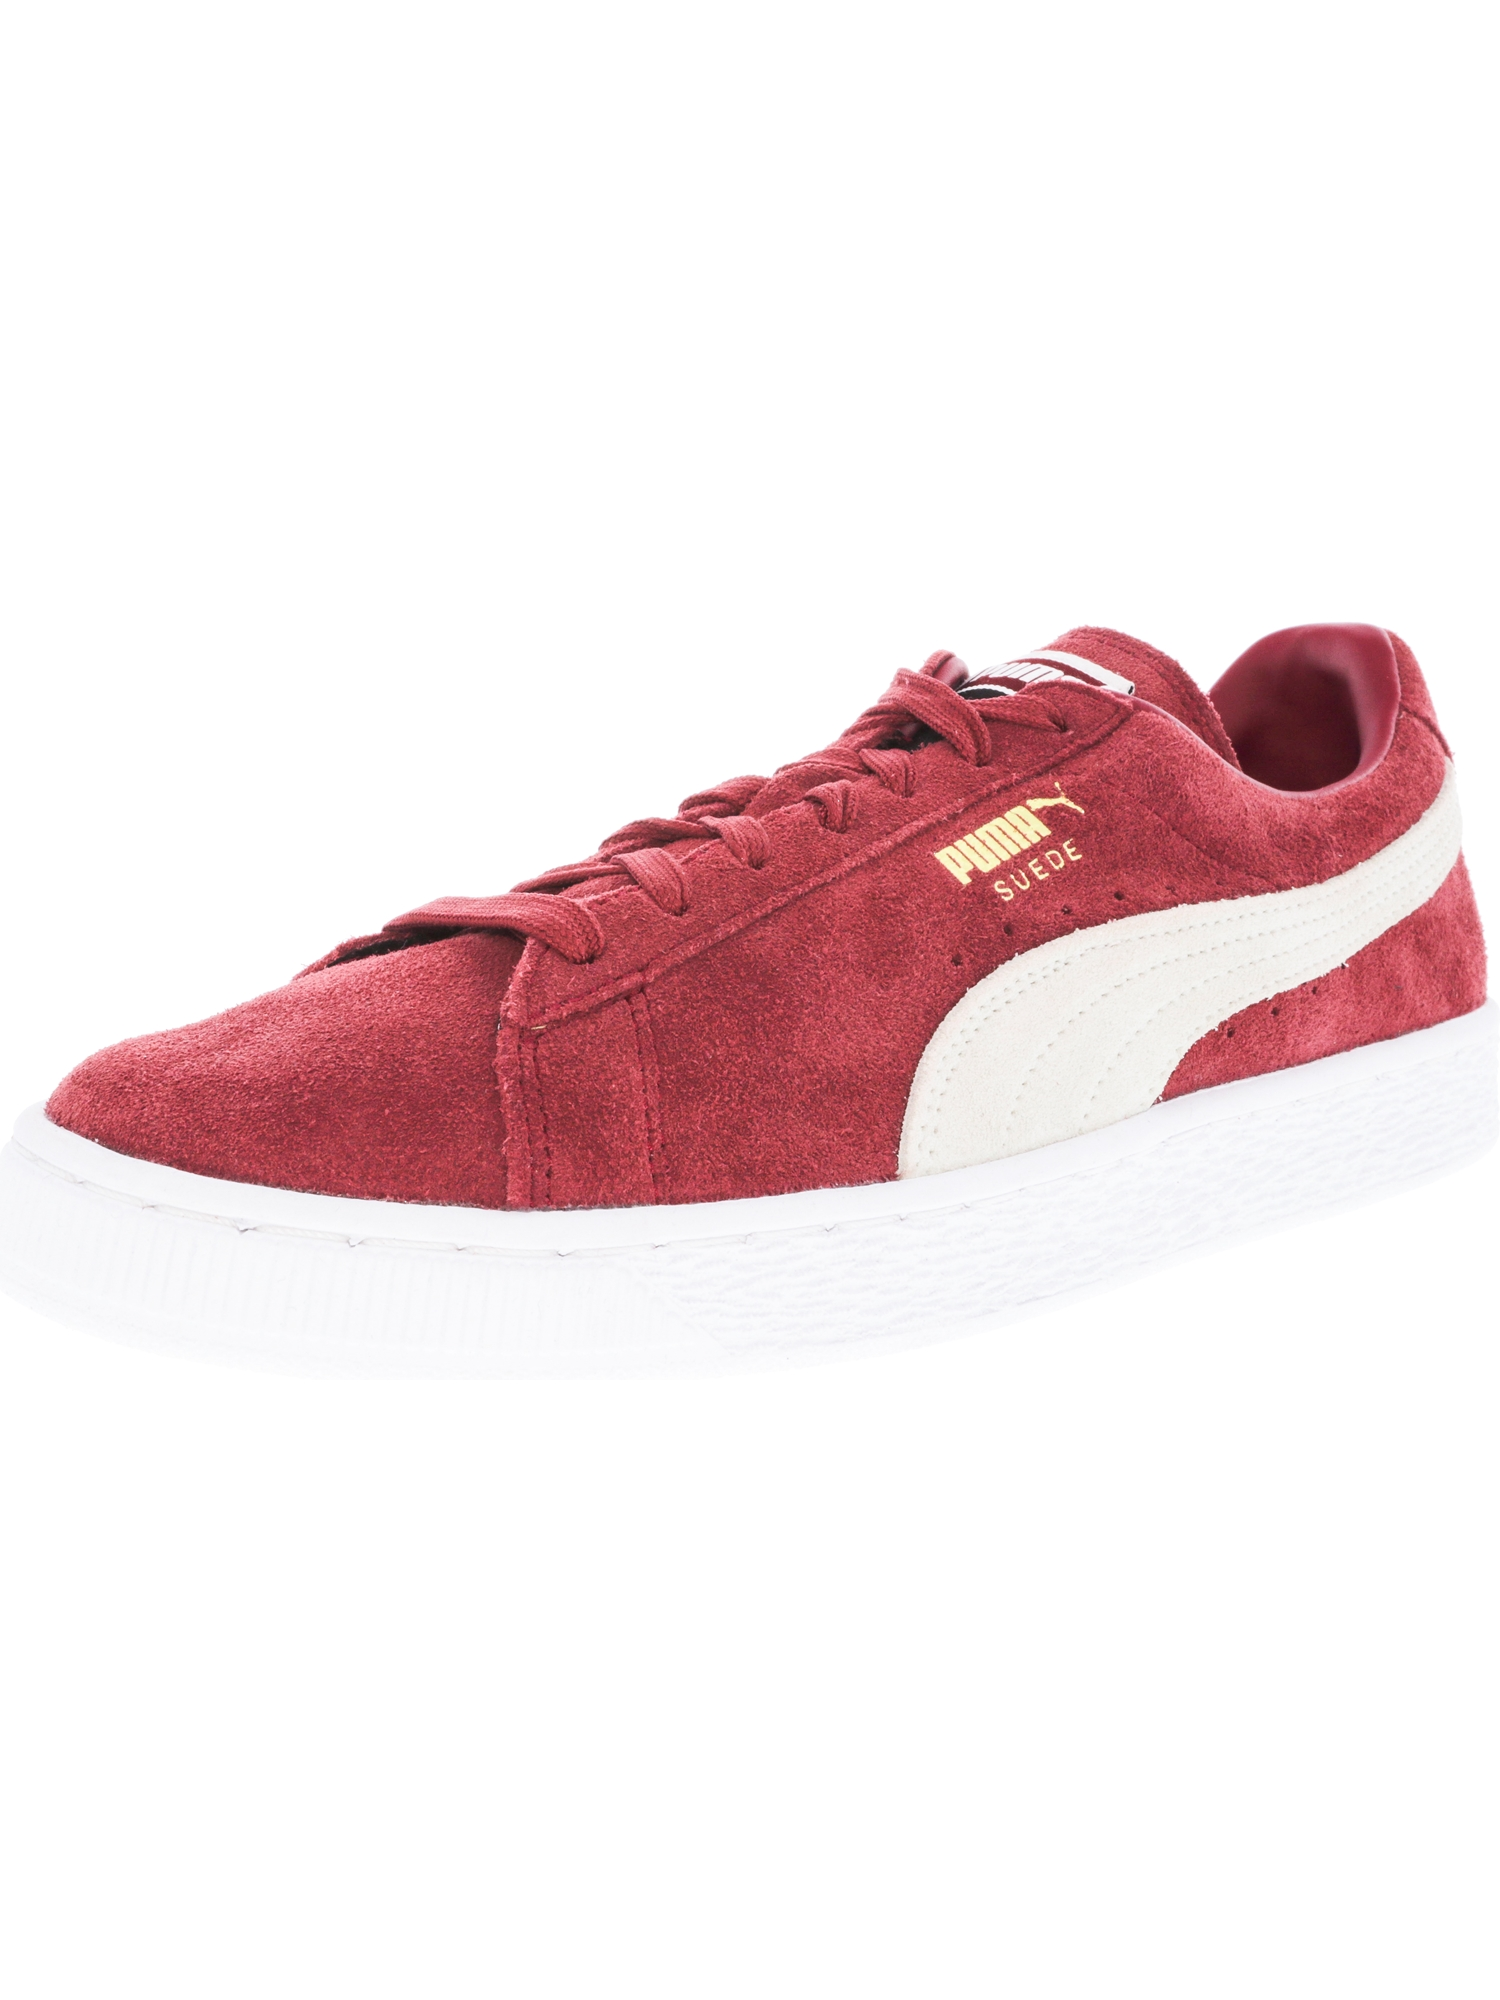 Puma Men's Suede Classic Tibetan Red / White Ankle-High Fashion Sneaker - 7M